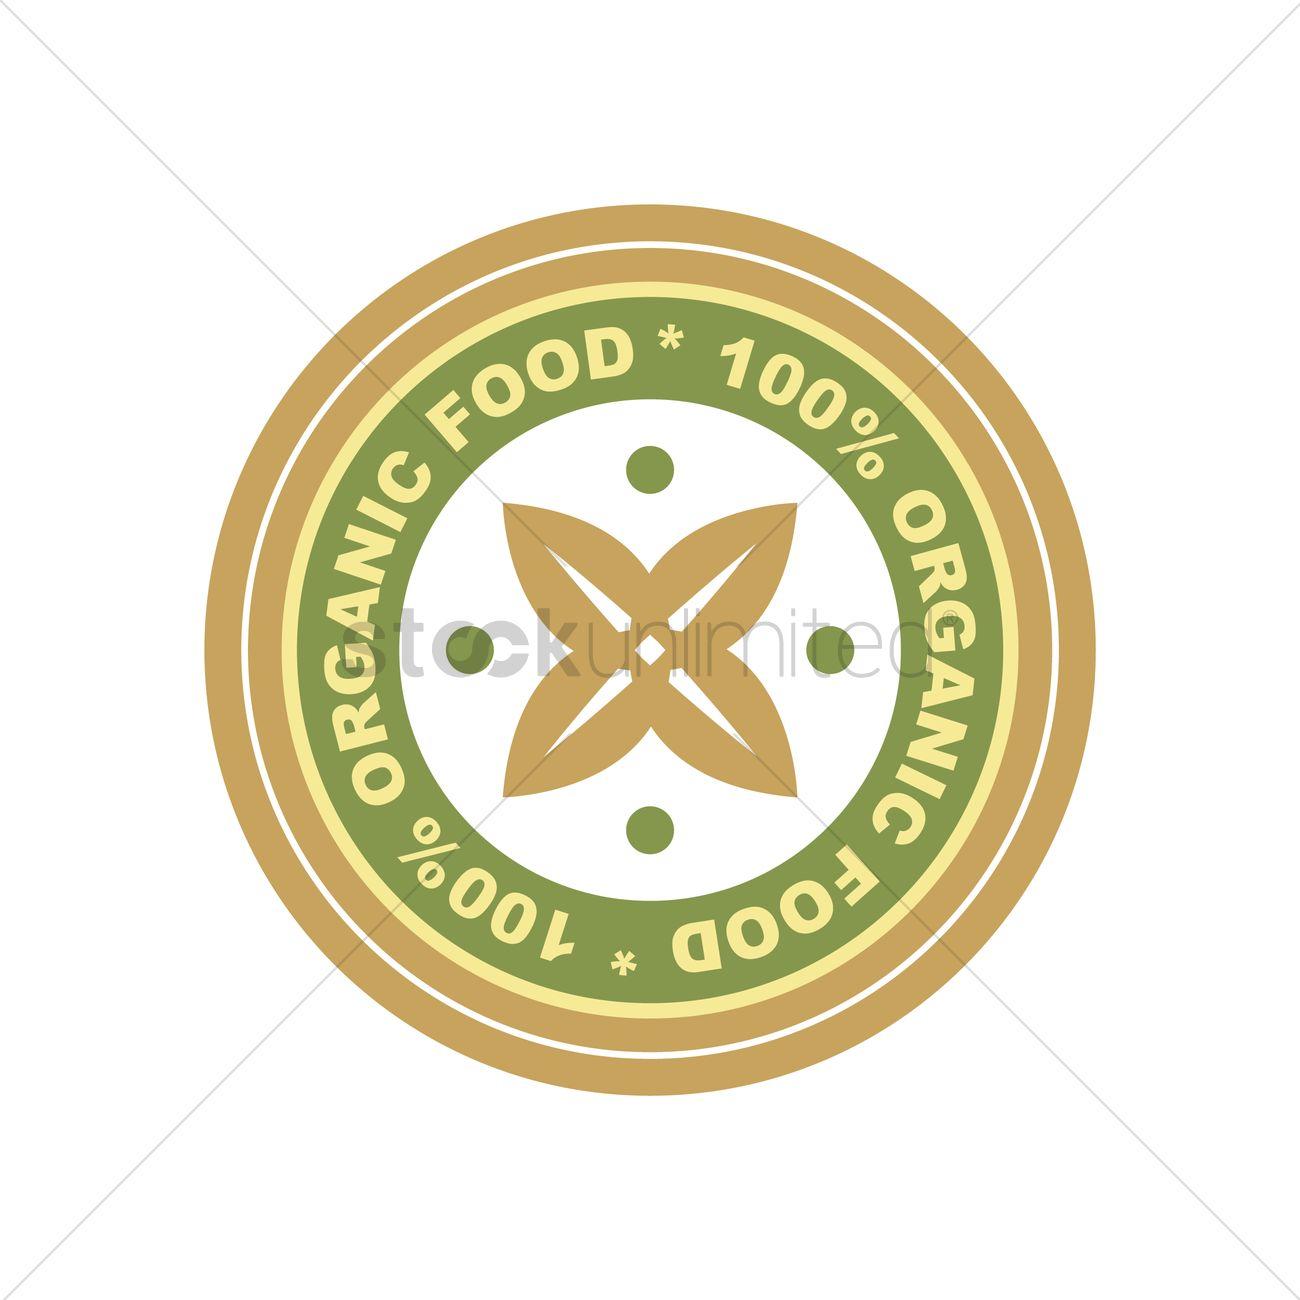 Organic food label design Vector Image - 2029882